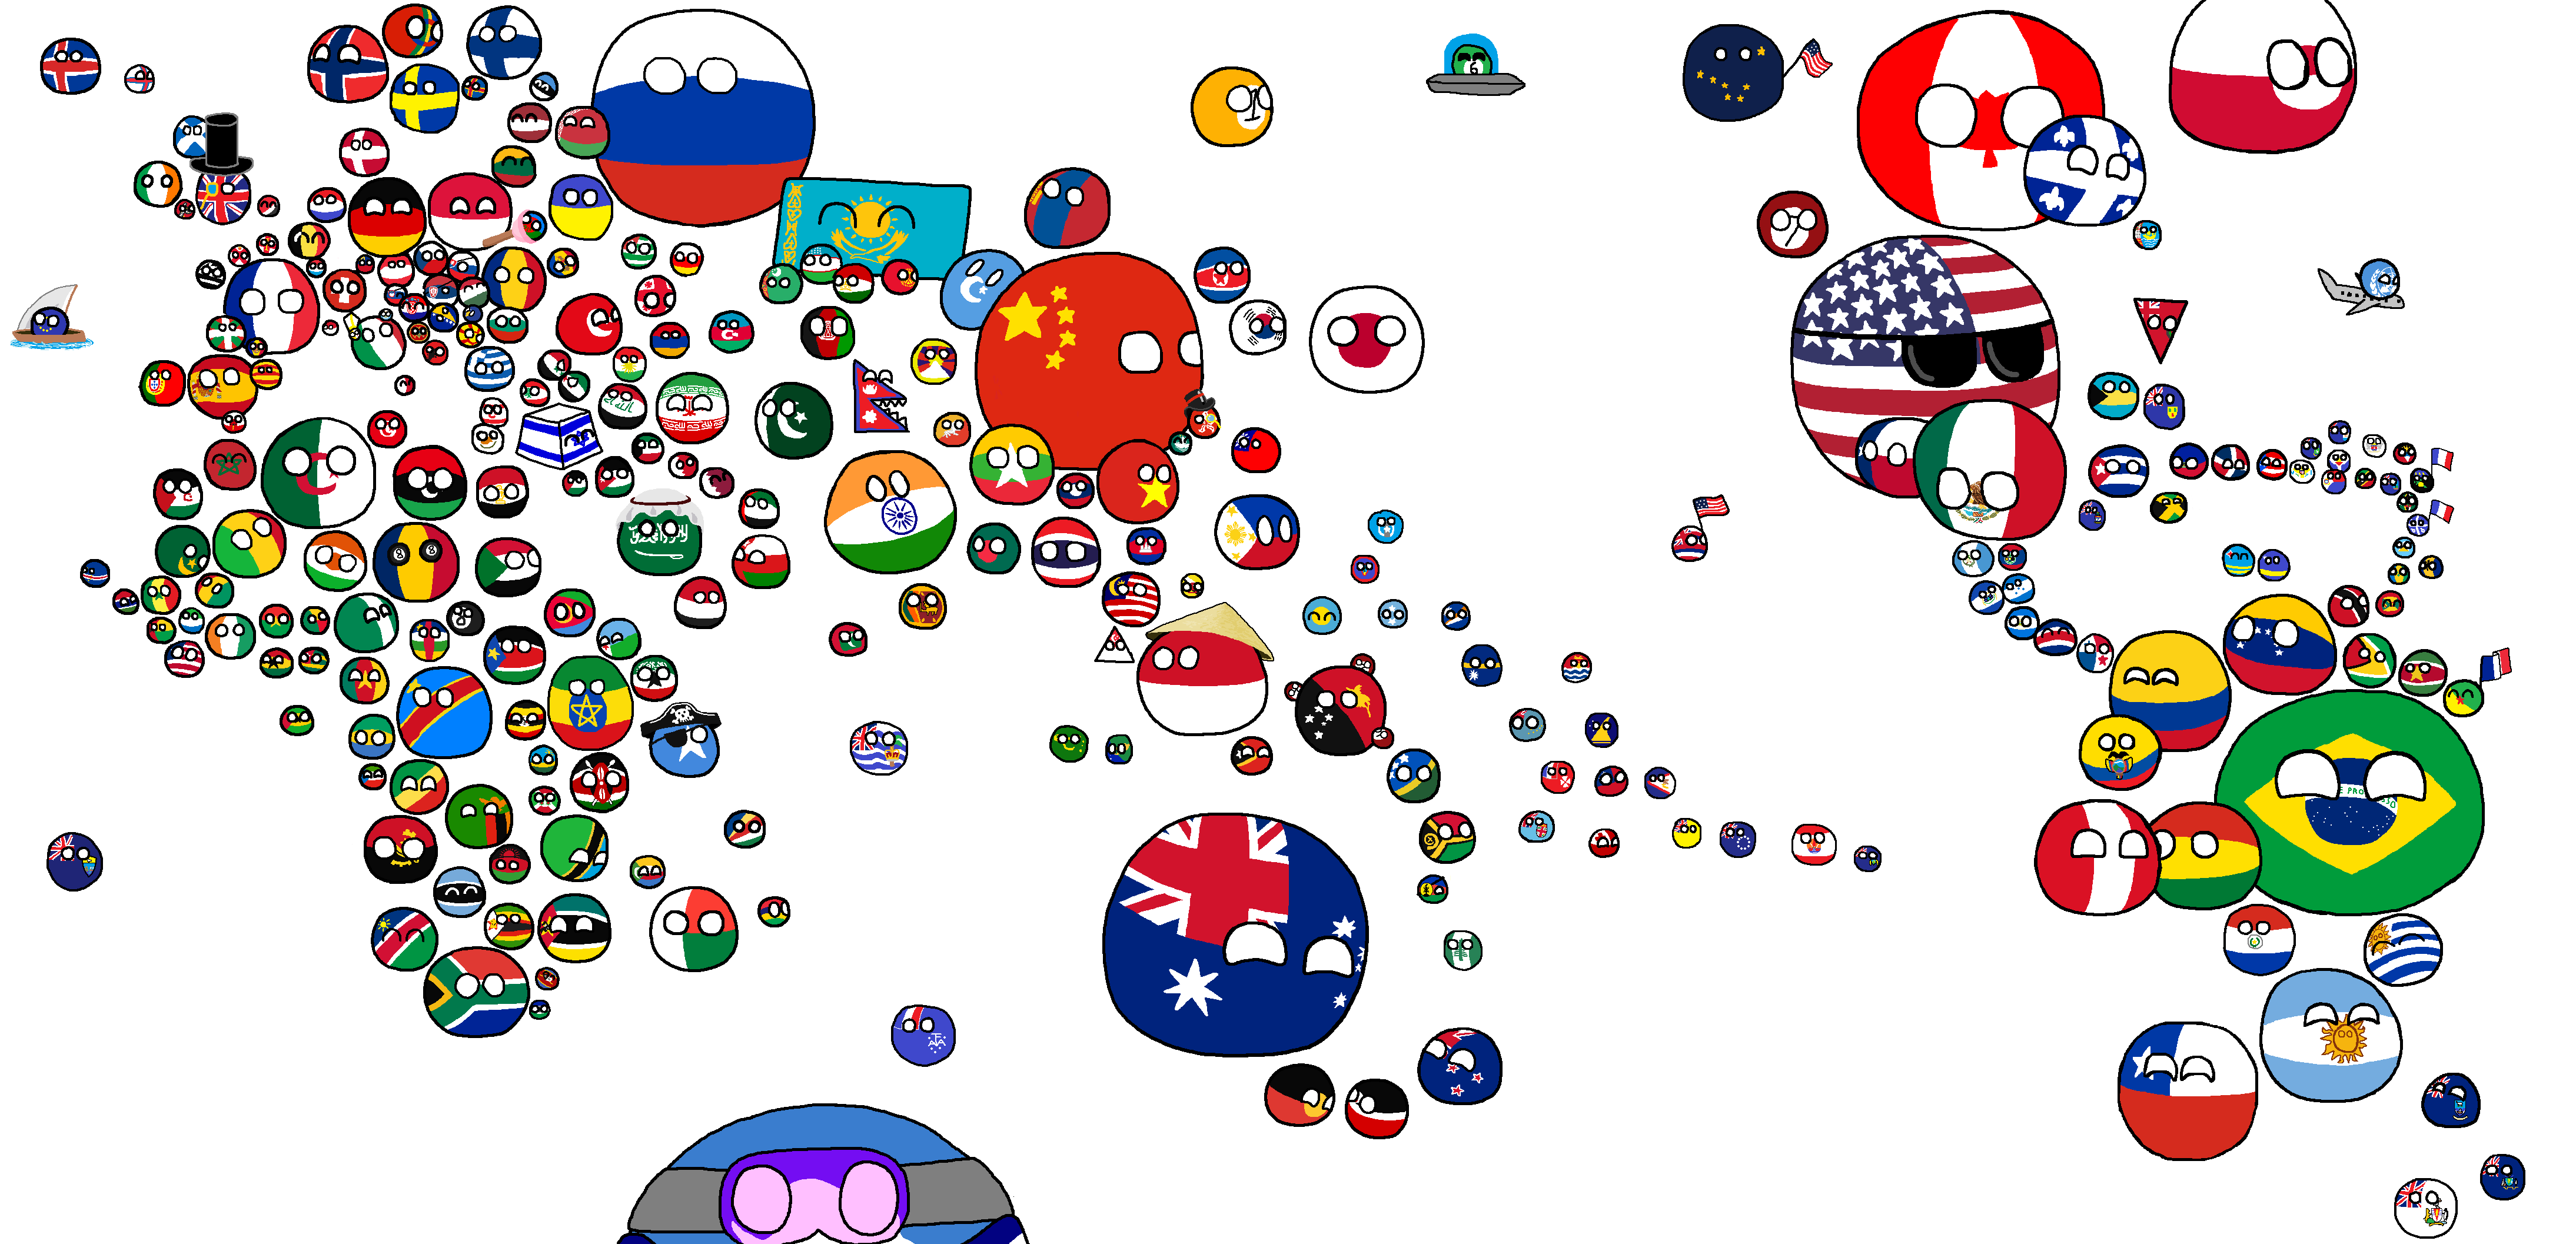 Filepolandball worldg wikimedia commons filepolandball worldg gumiabroncs Choice Image